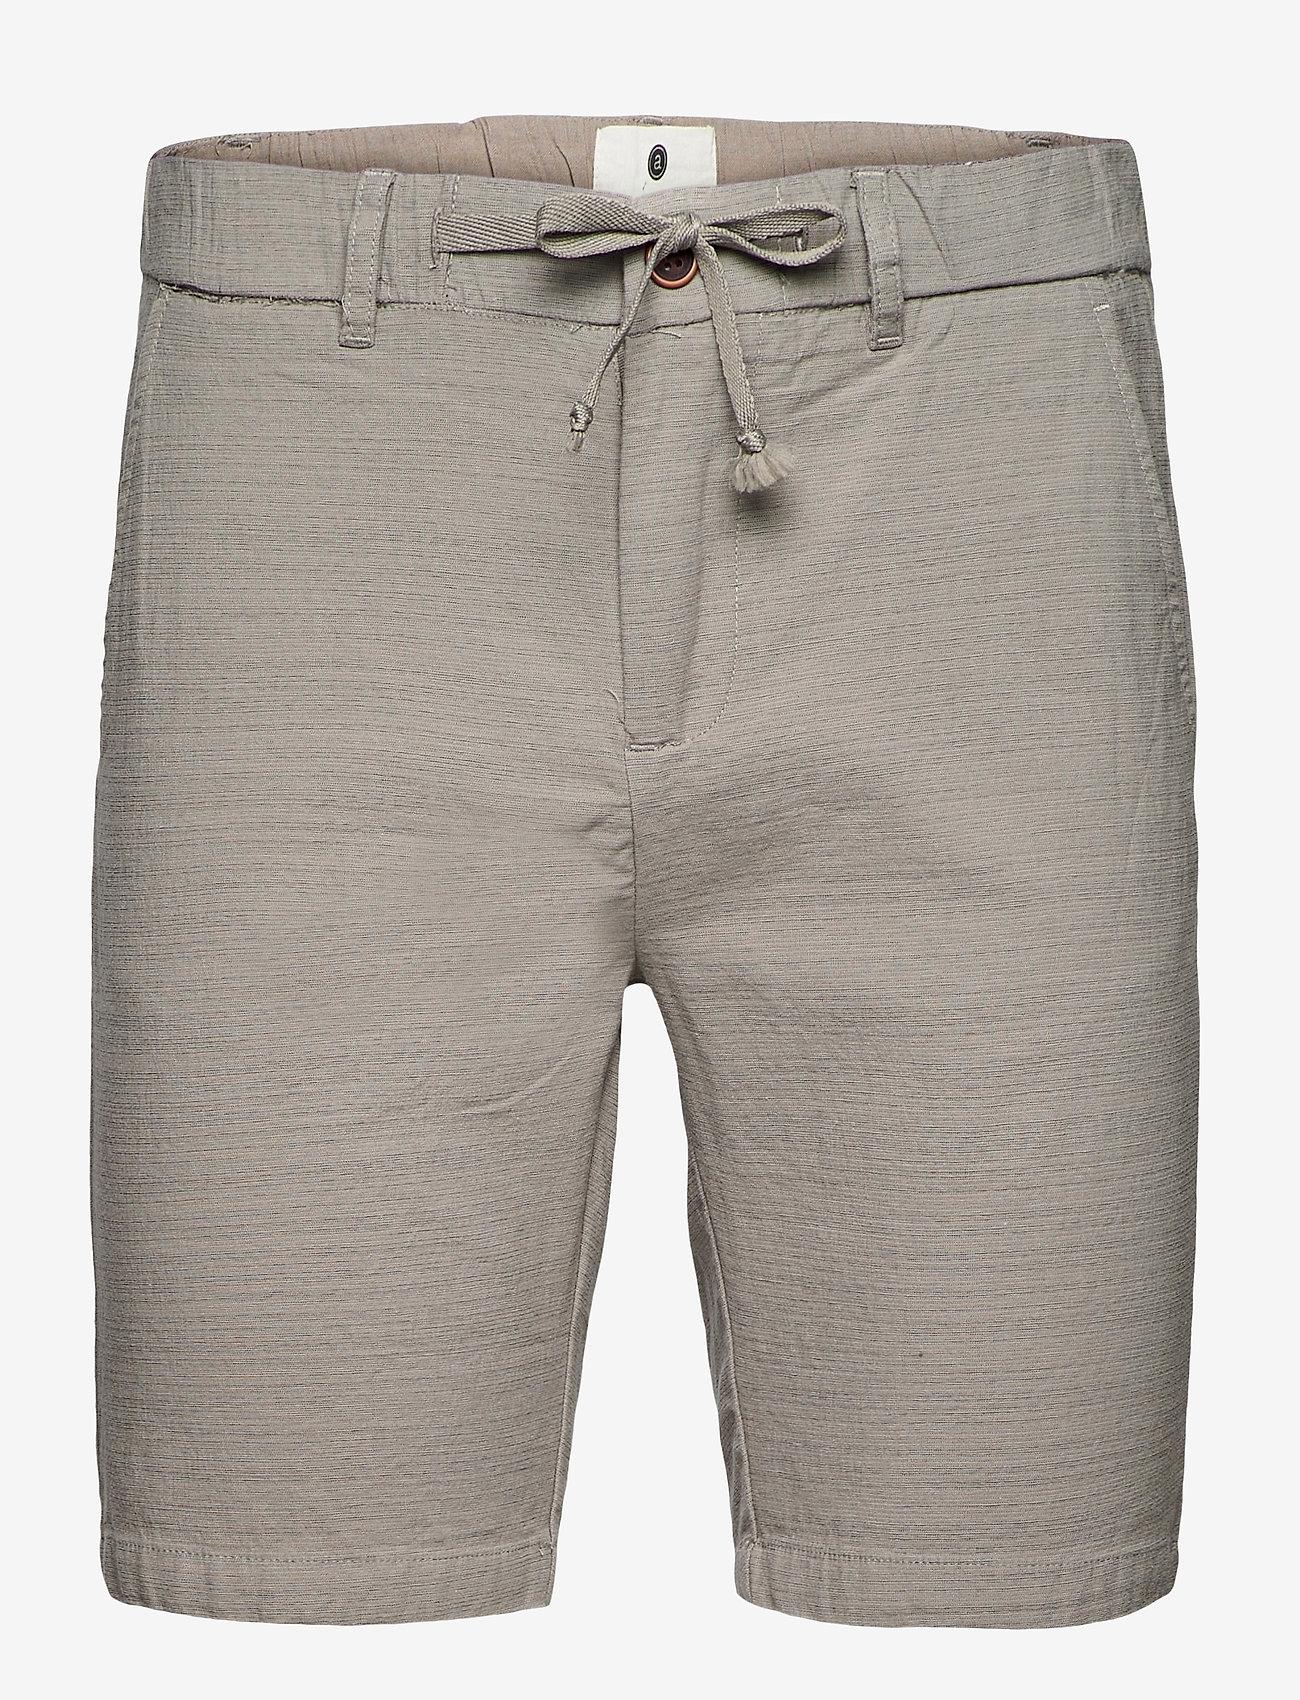 Anerkjendt - AKJENS LT ELASTIC SHORTS - casual shorts - brindle - 1